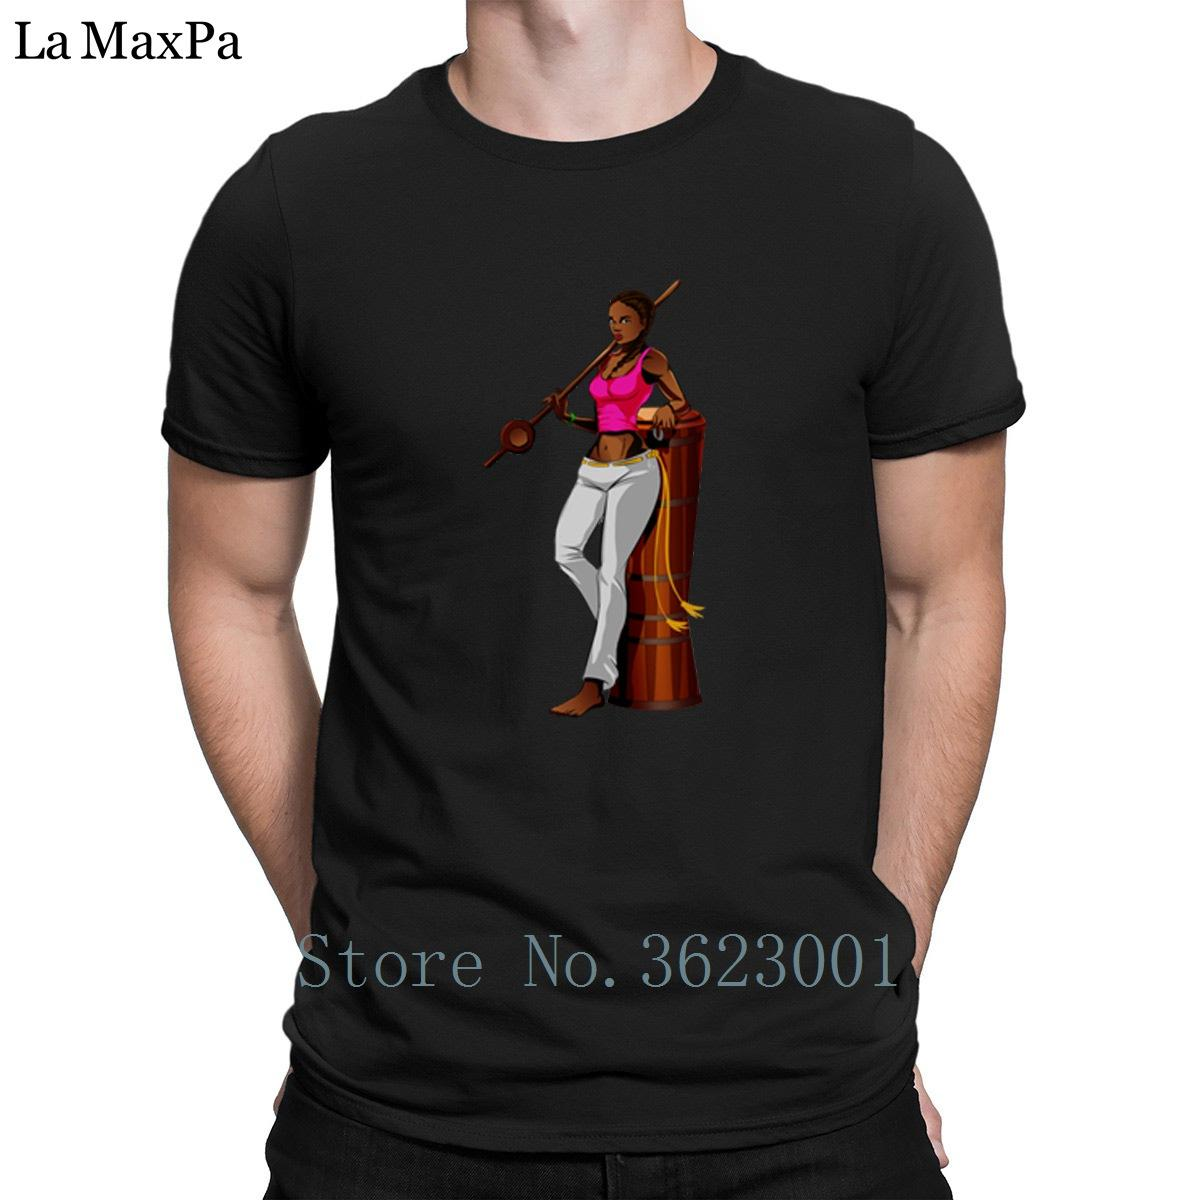 d8d4d3aec5e0 T Hommes Mode Tee Imprimé Shirt Hommes Acheter Femmes Shirt Capoeira  w7tgZqAnx